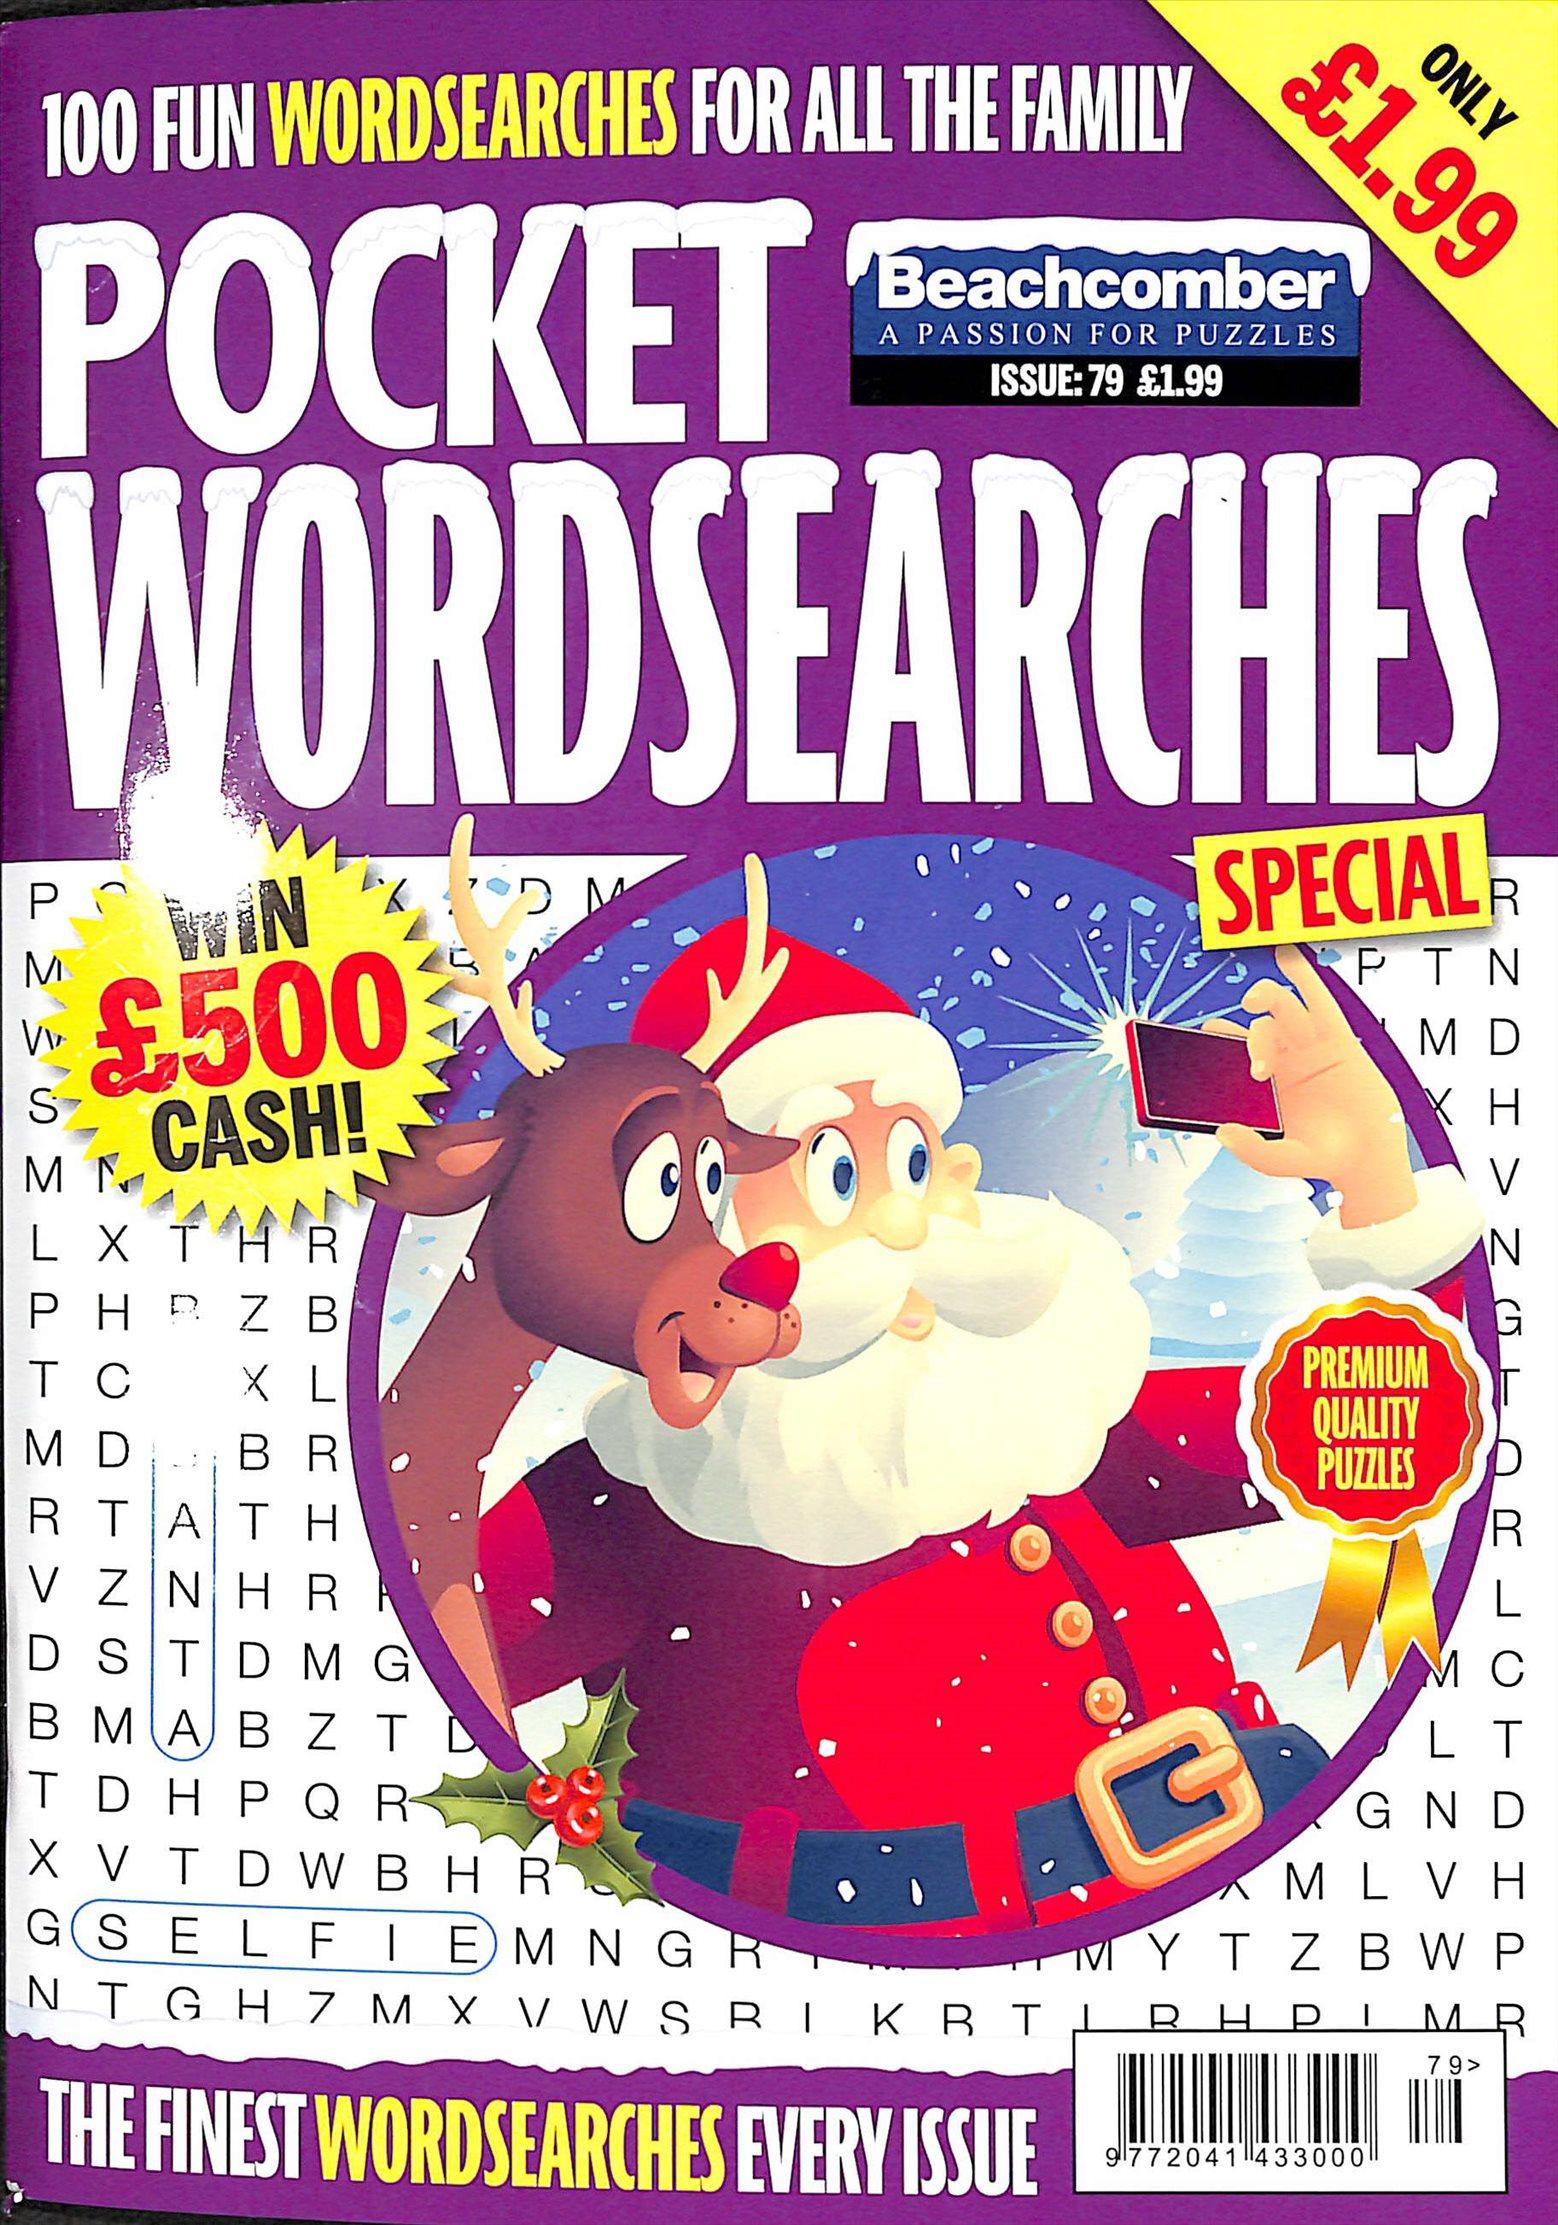 POCKET WORDSEARCHES SP